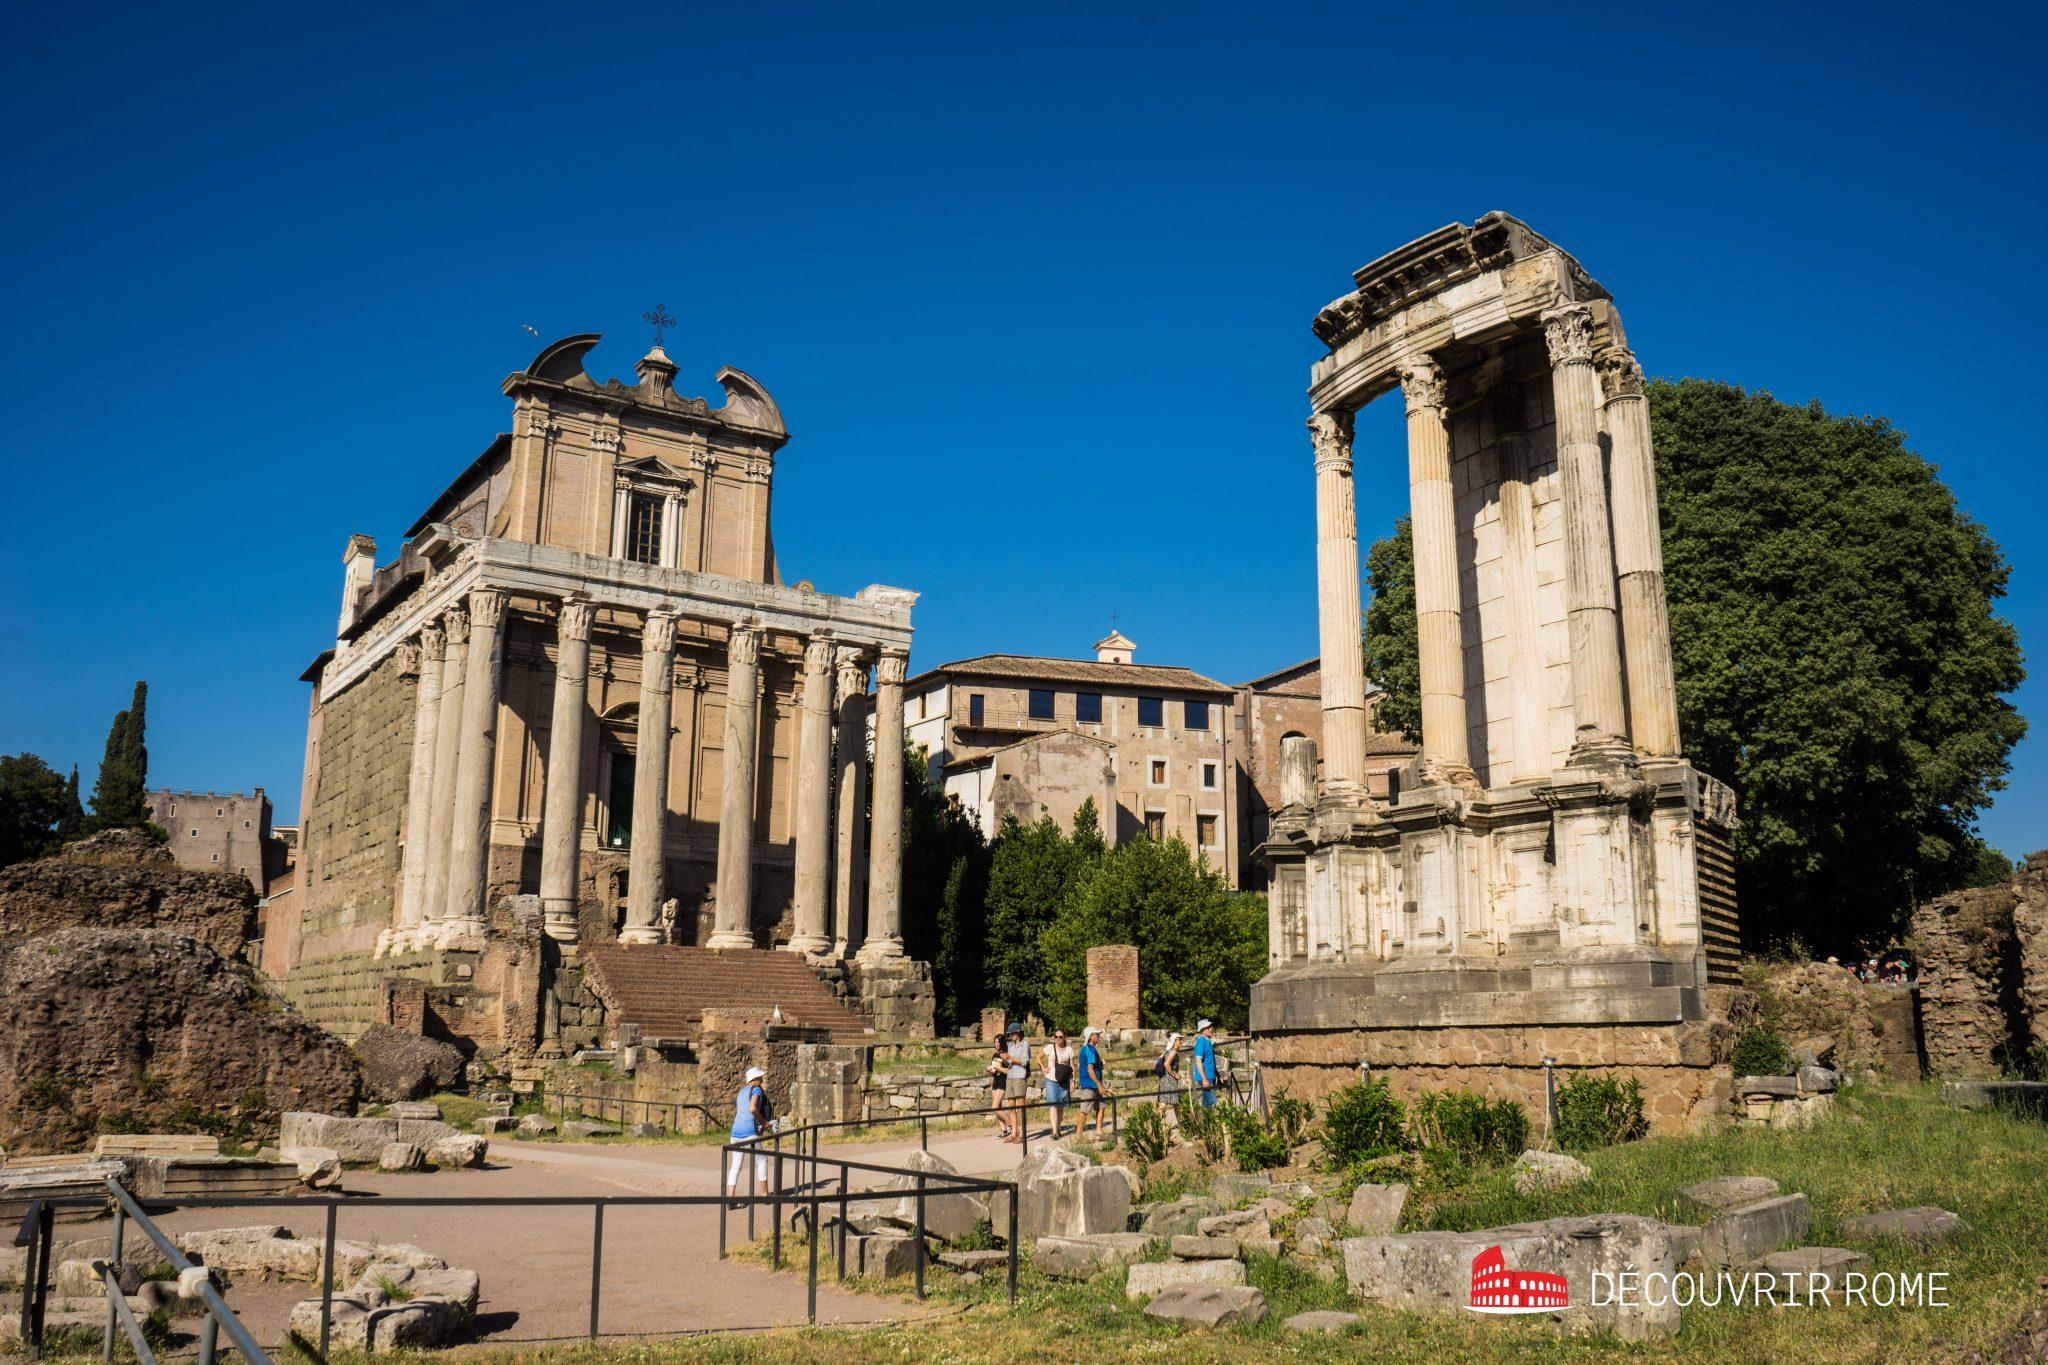 Temple Forum